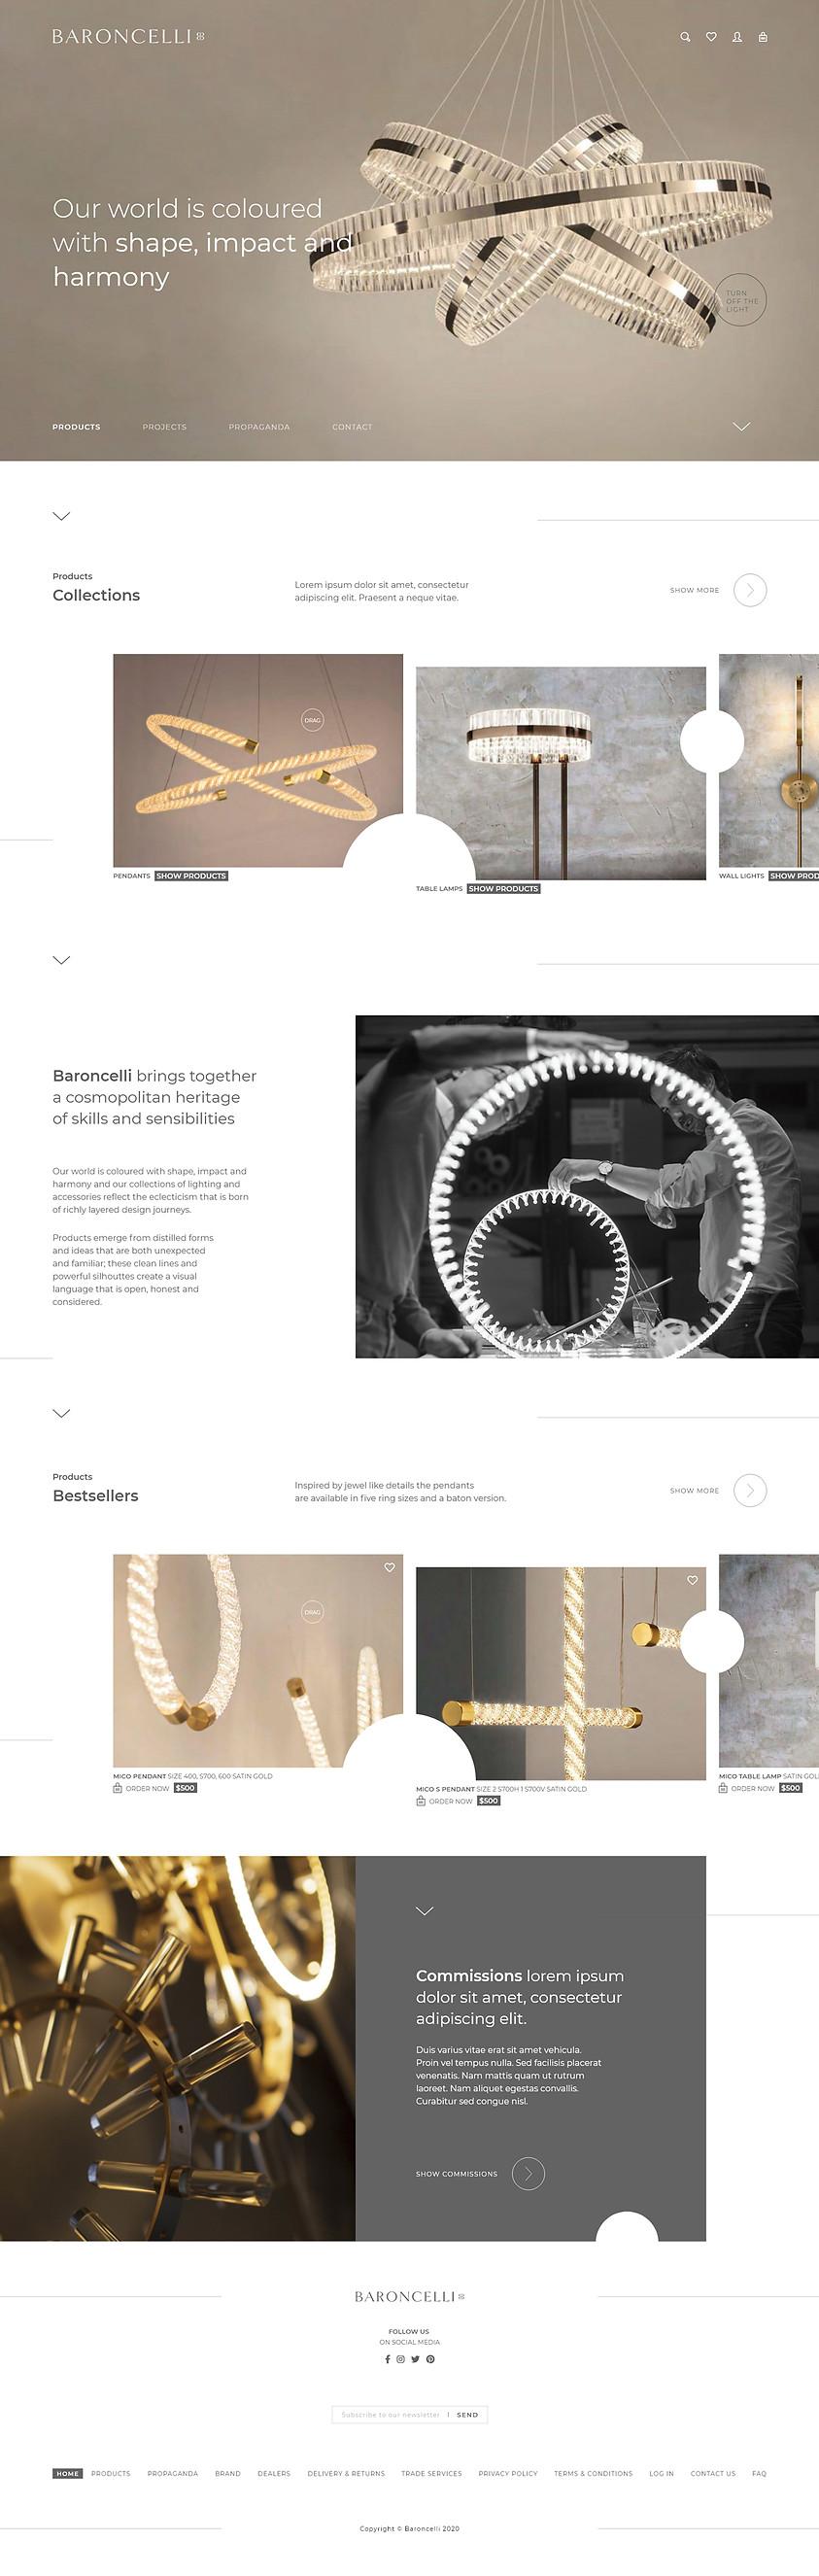 Baroncelli_homepage_v4_mini_light.jpg